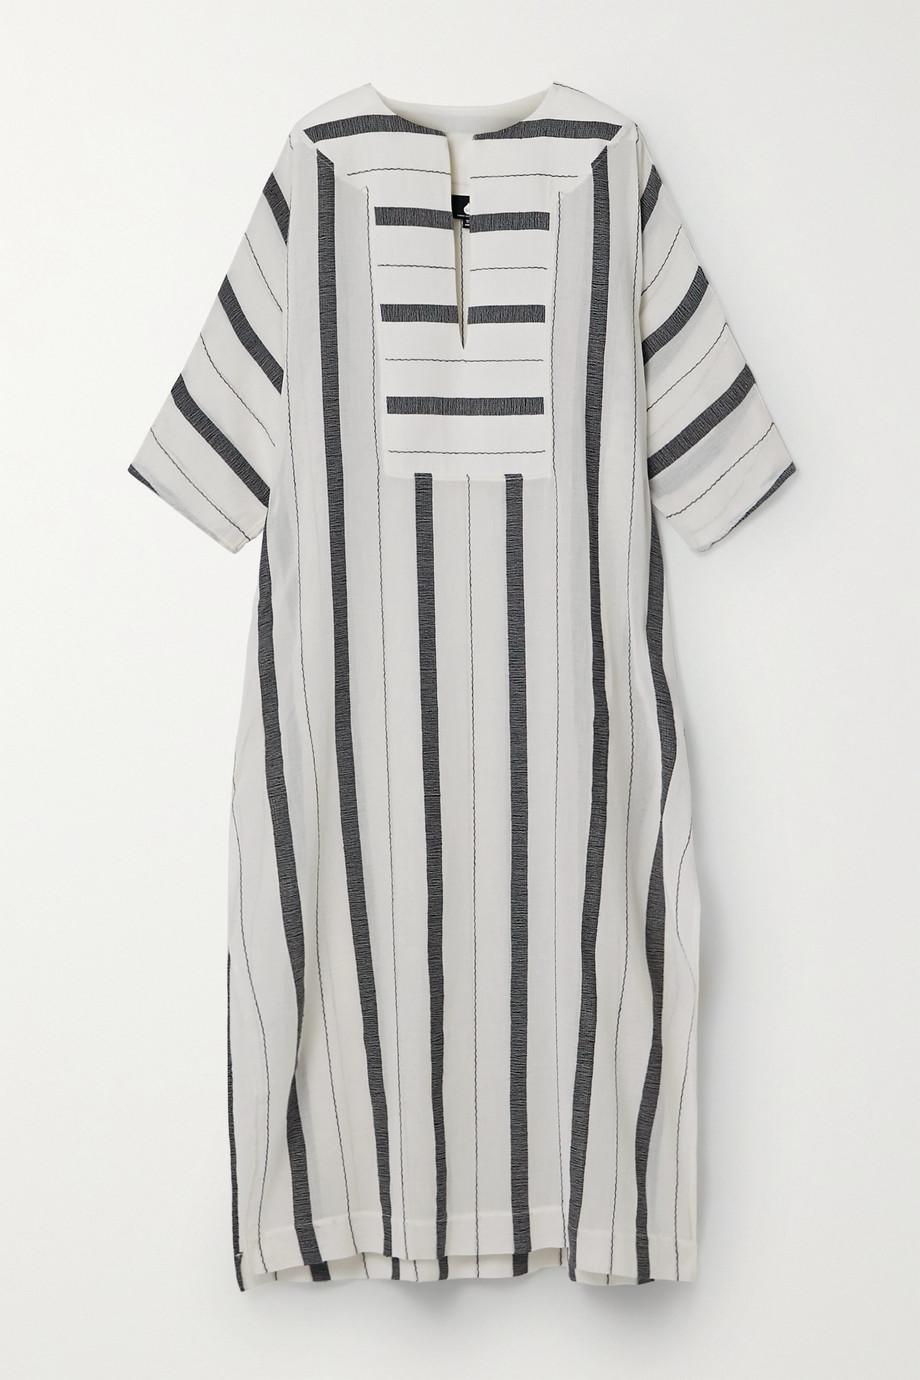 SU Paris Gaya 条纹纯棉薄纱长罩衫裙